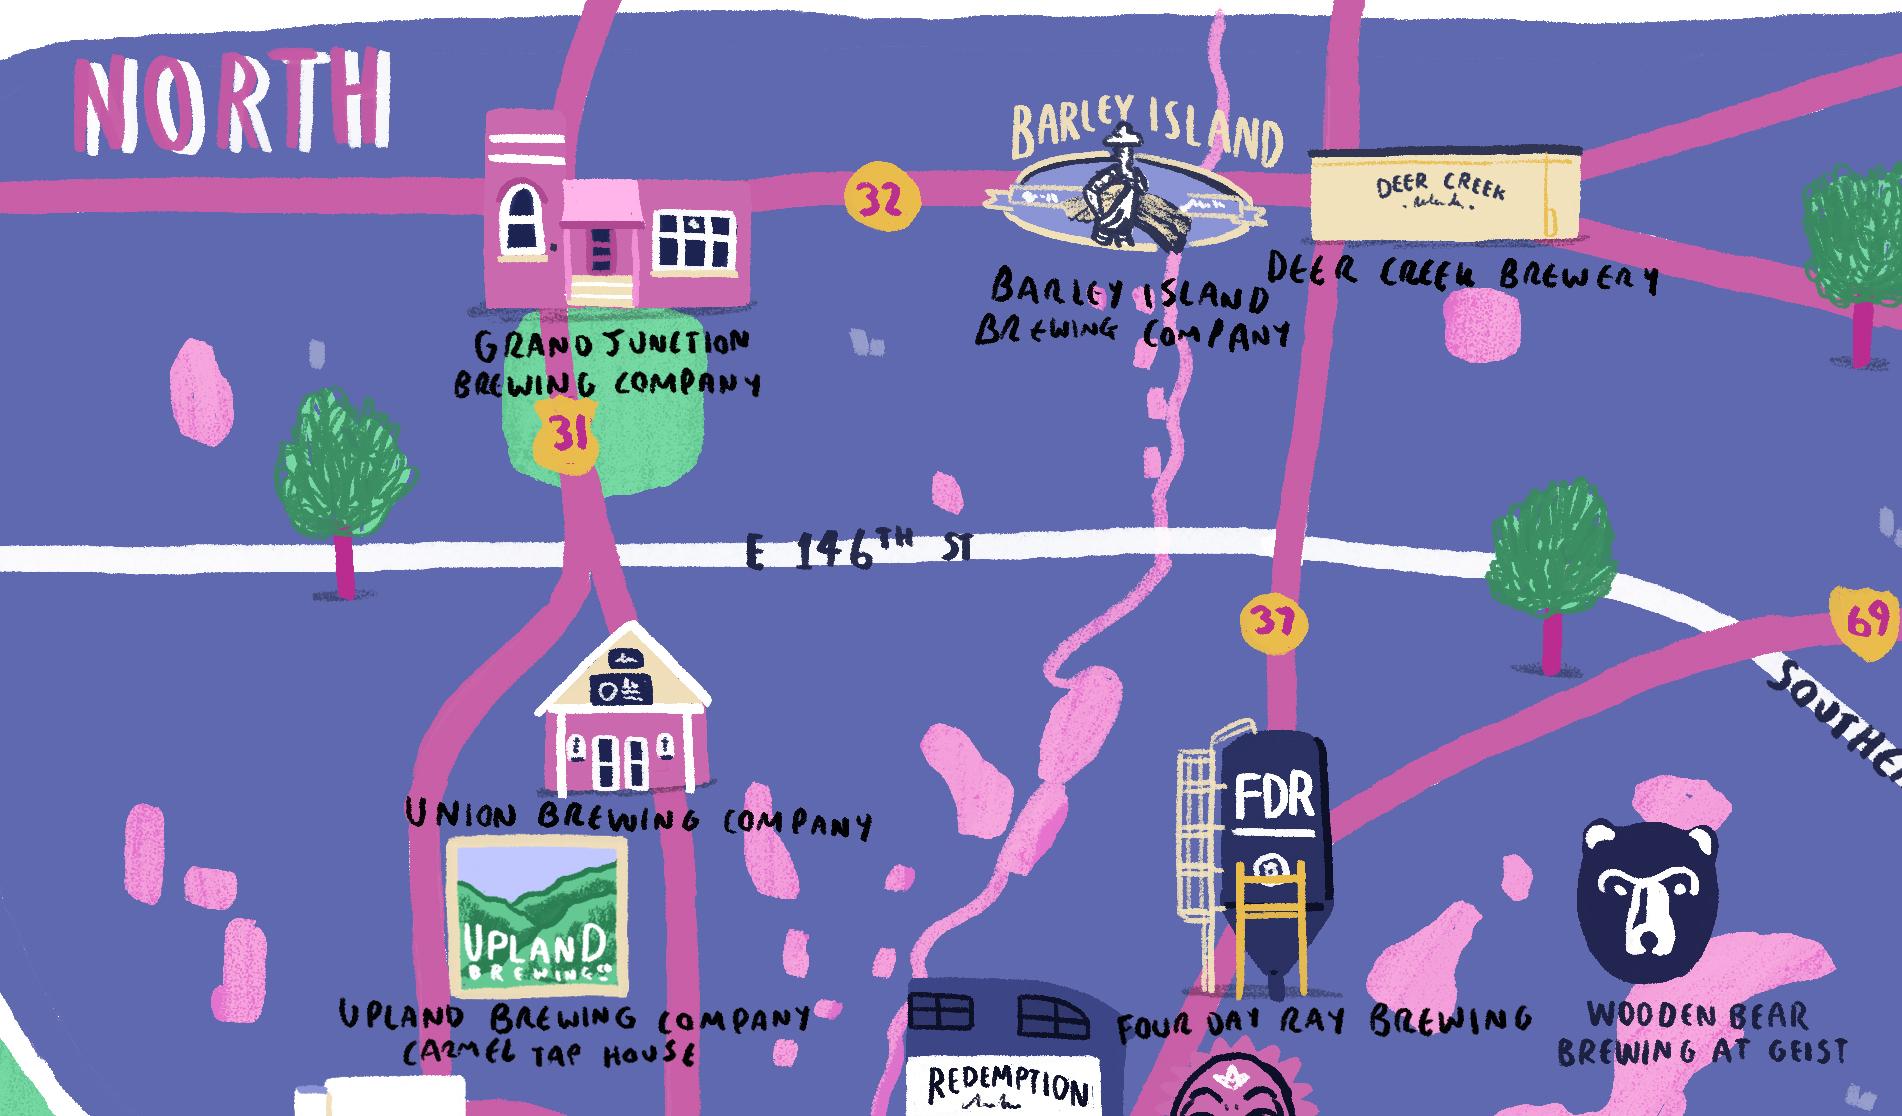 Indianapolis Craft Beer Map 3 close 2.jpg